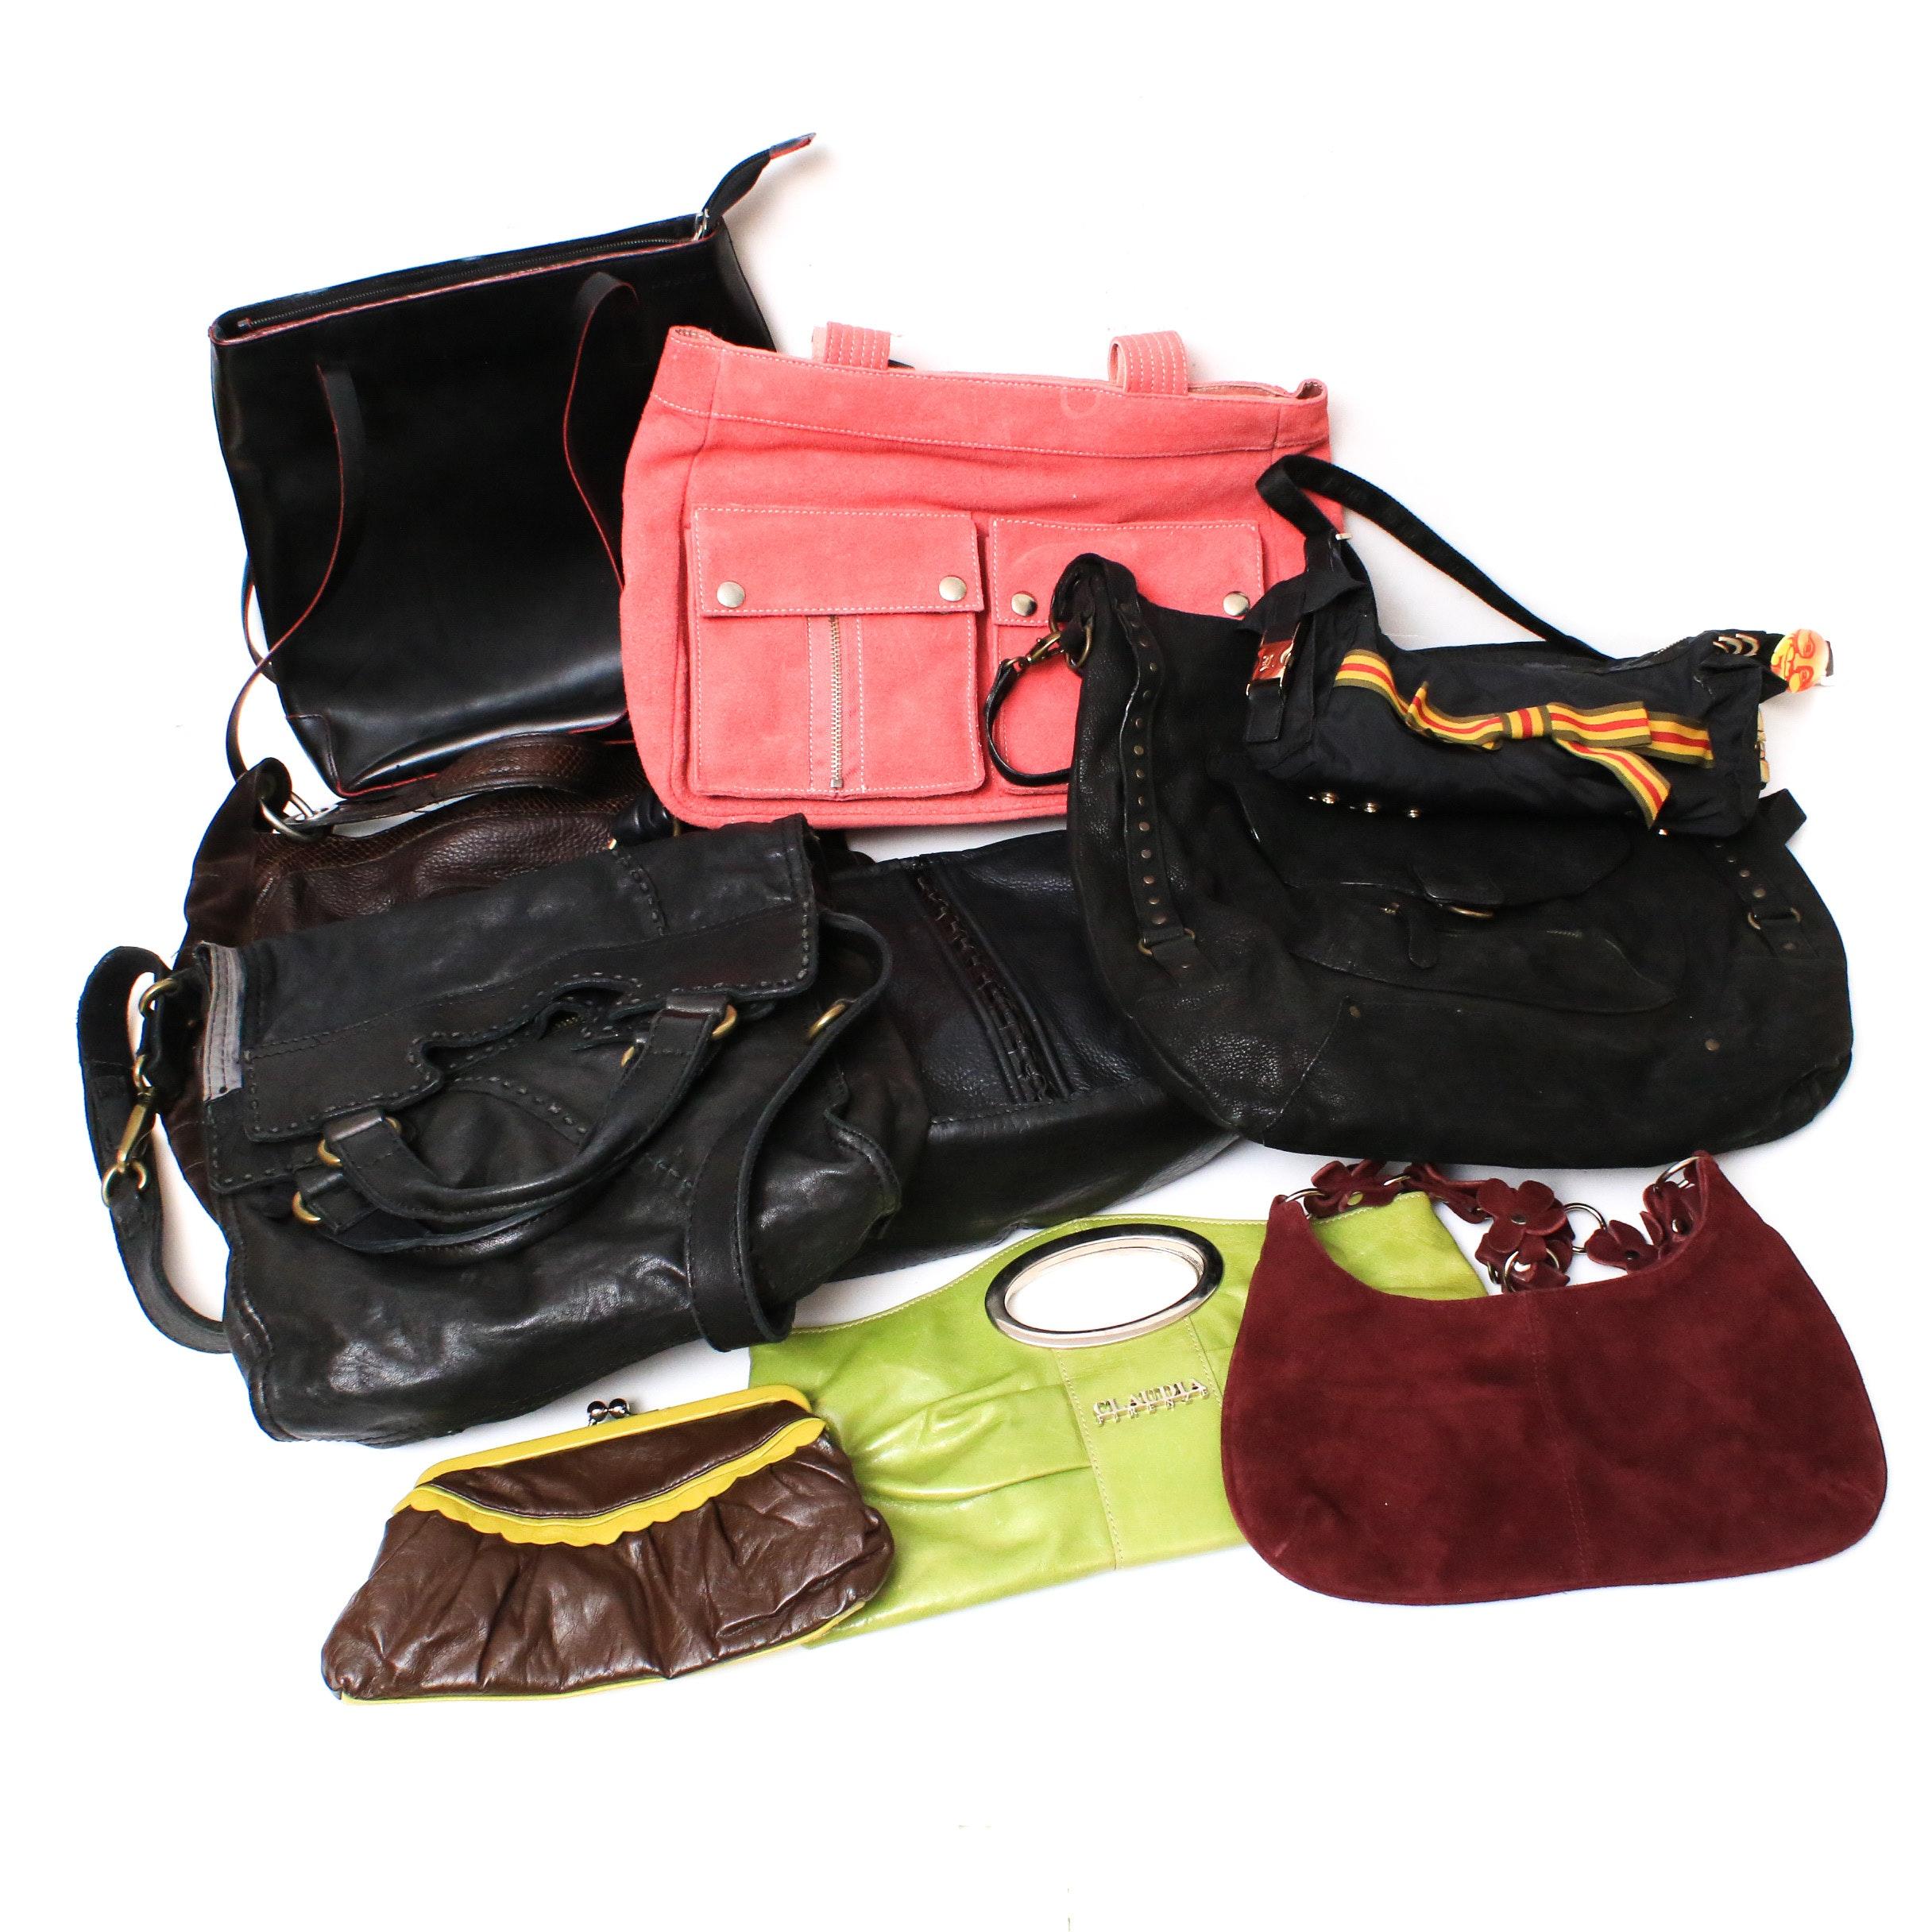 Claudia Firenze, Le Sportsac, Abaco, Banana Republic, and More Handbags